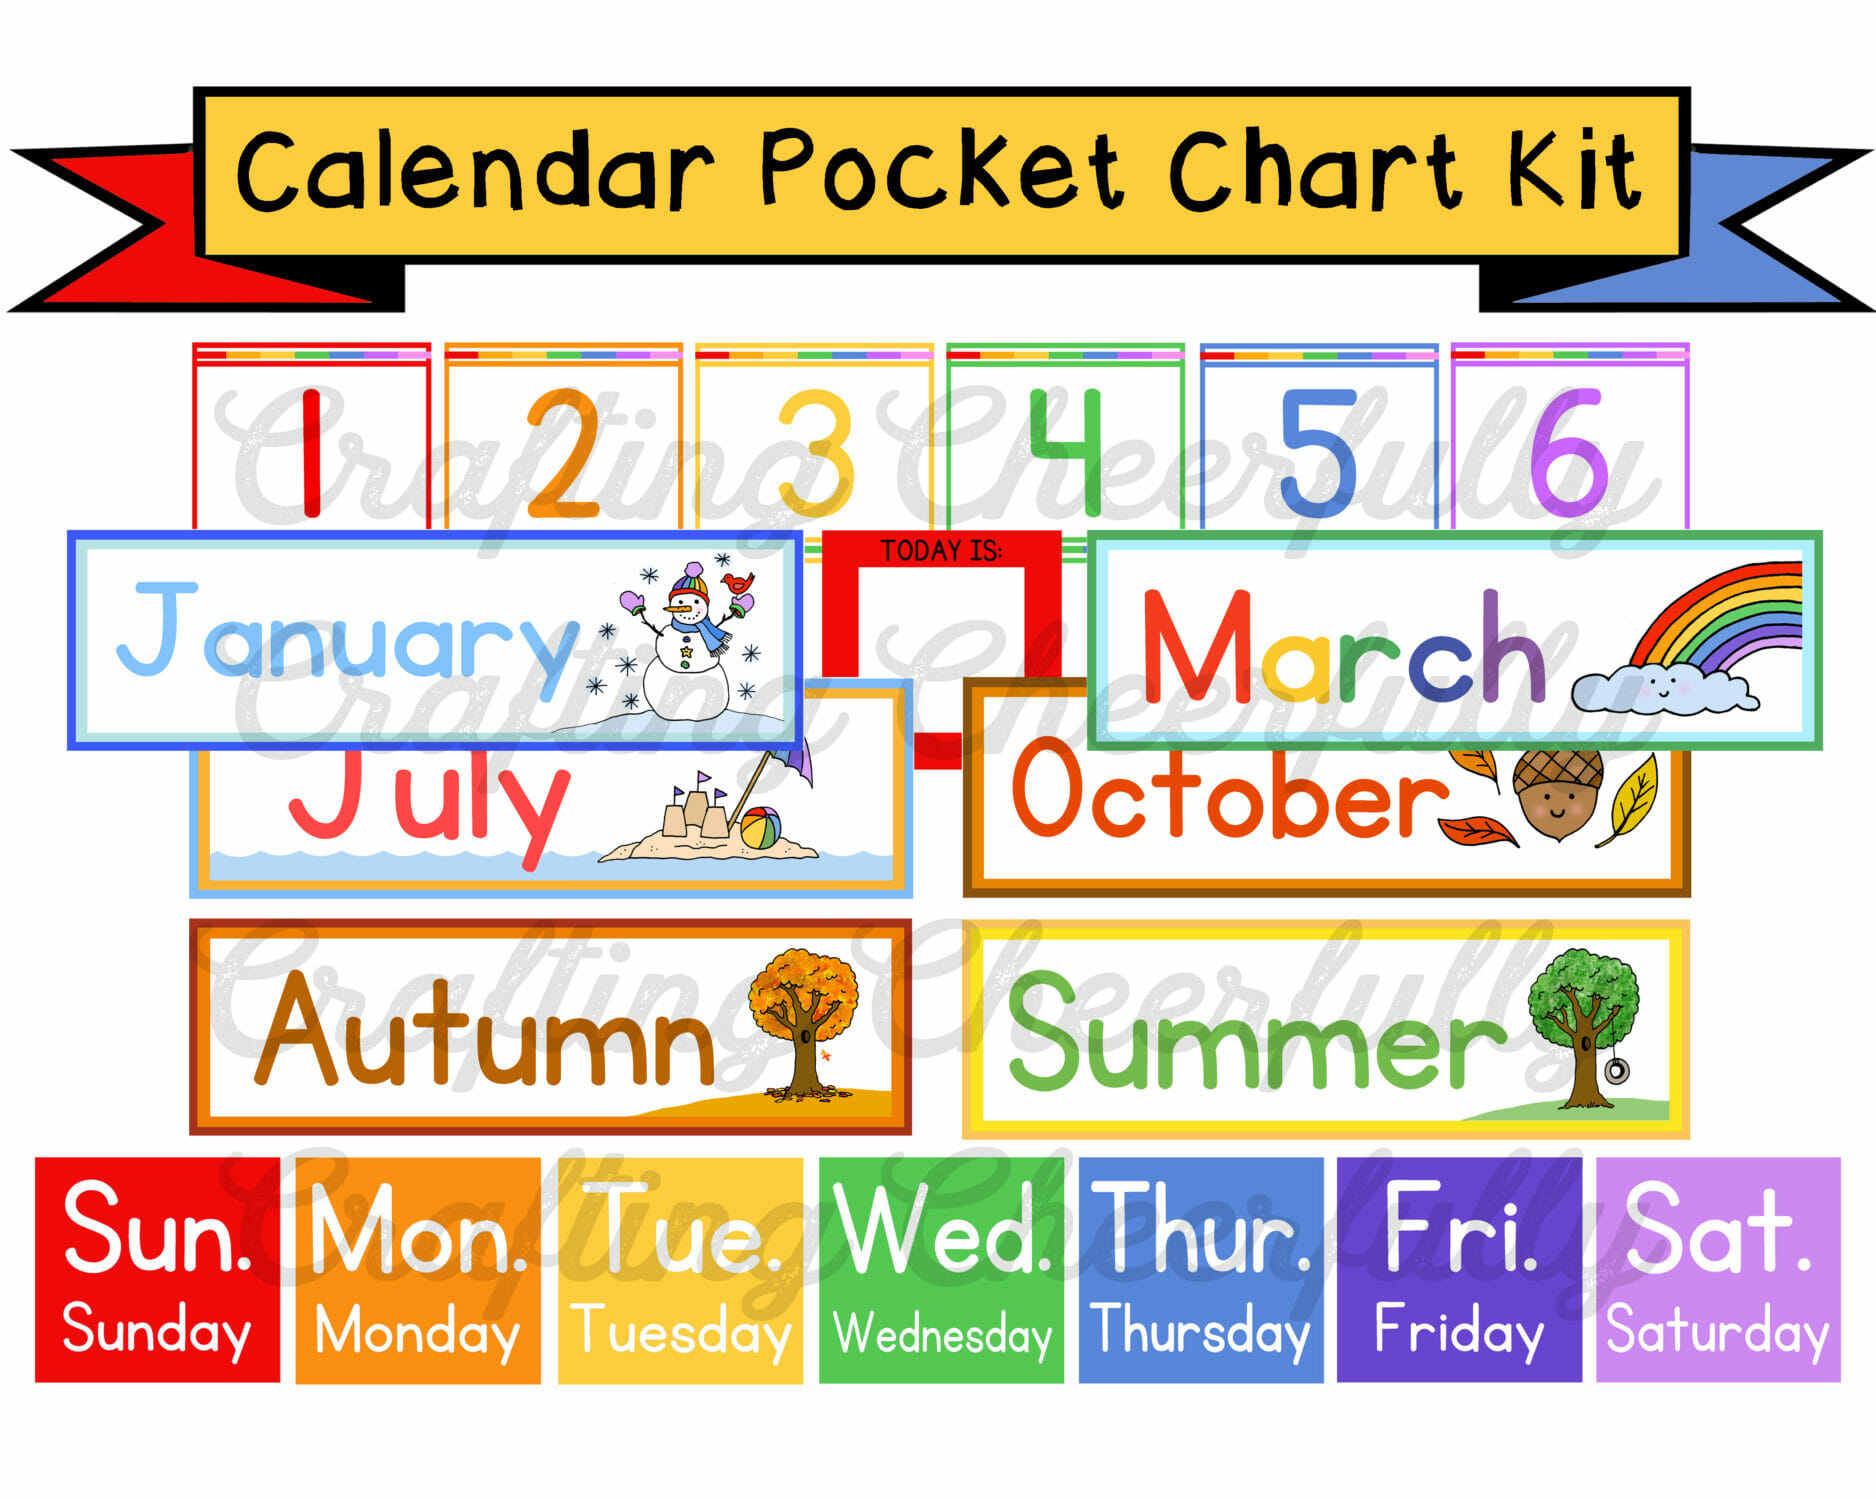 Pocket Chart Calendar Kit